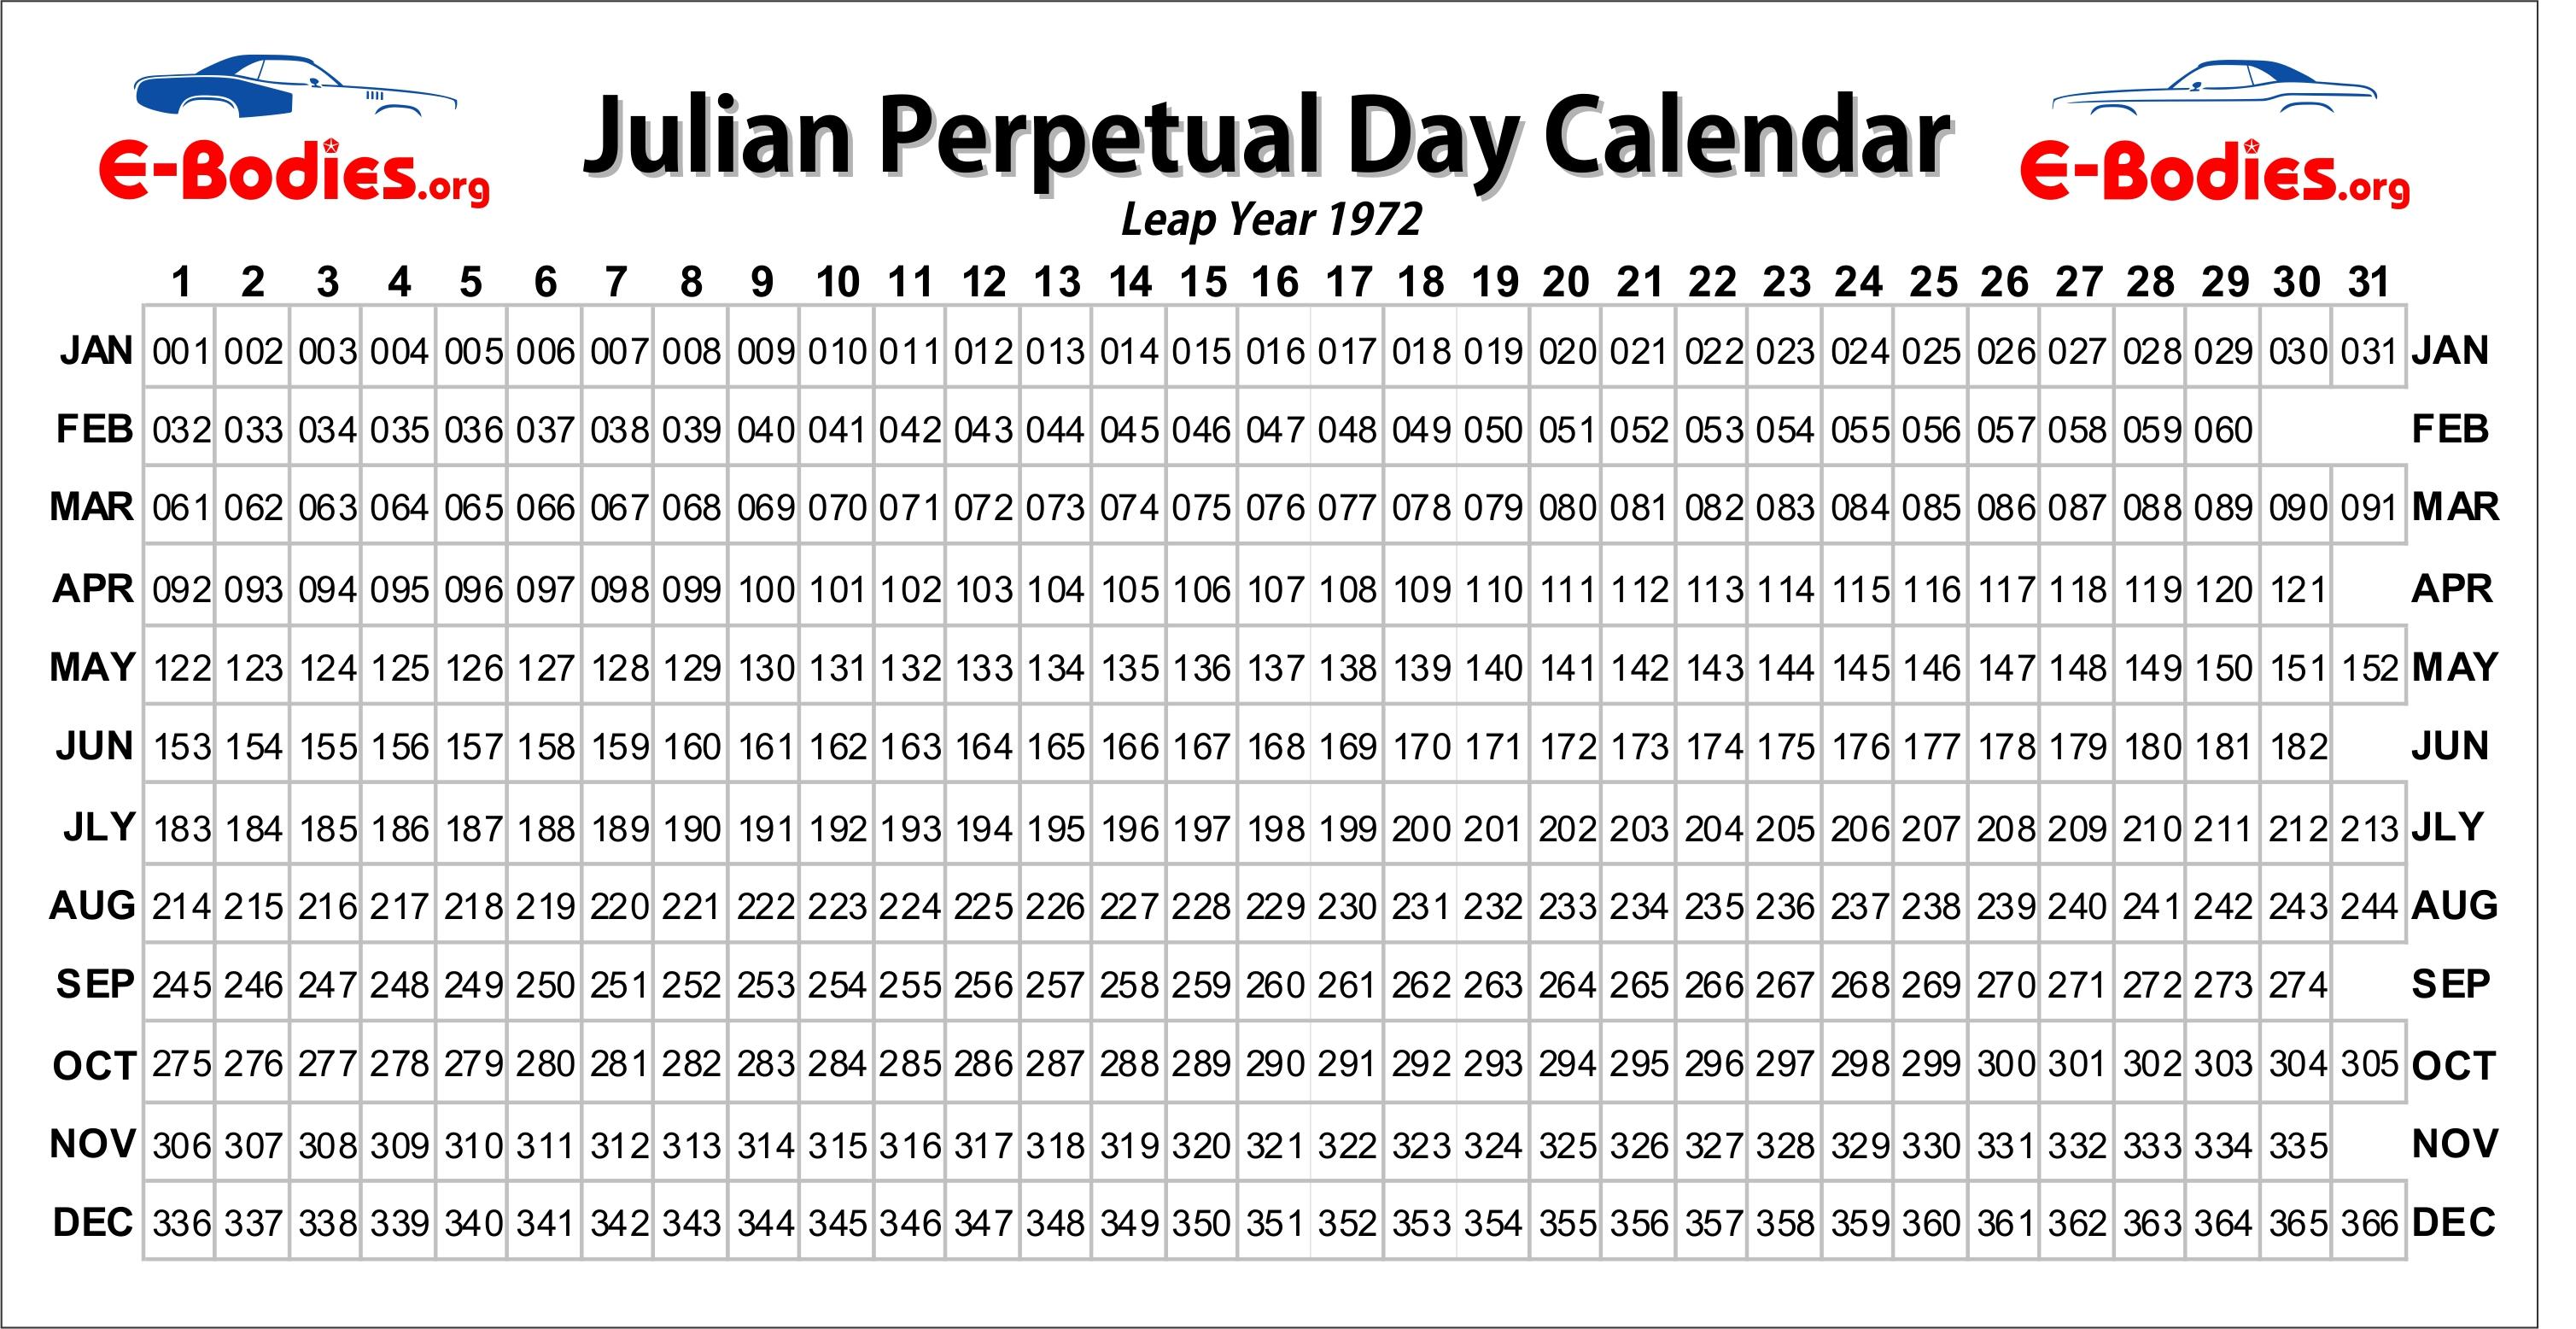 Julian Leap Year Calendar : Mopar julian perpetual day calendar leap year u2013 e bodies